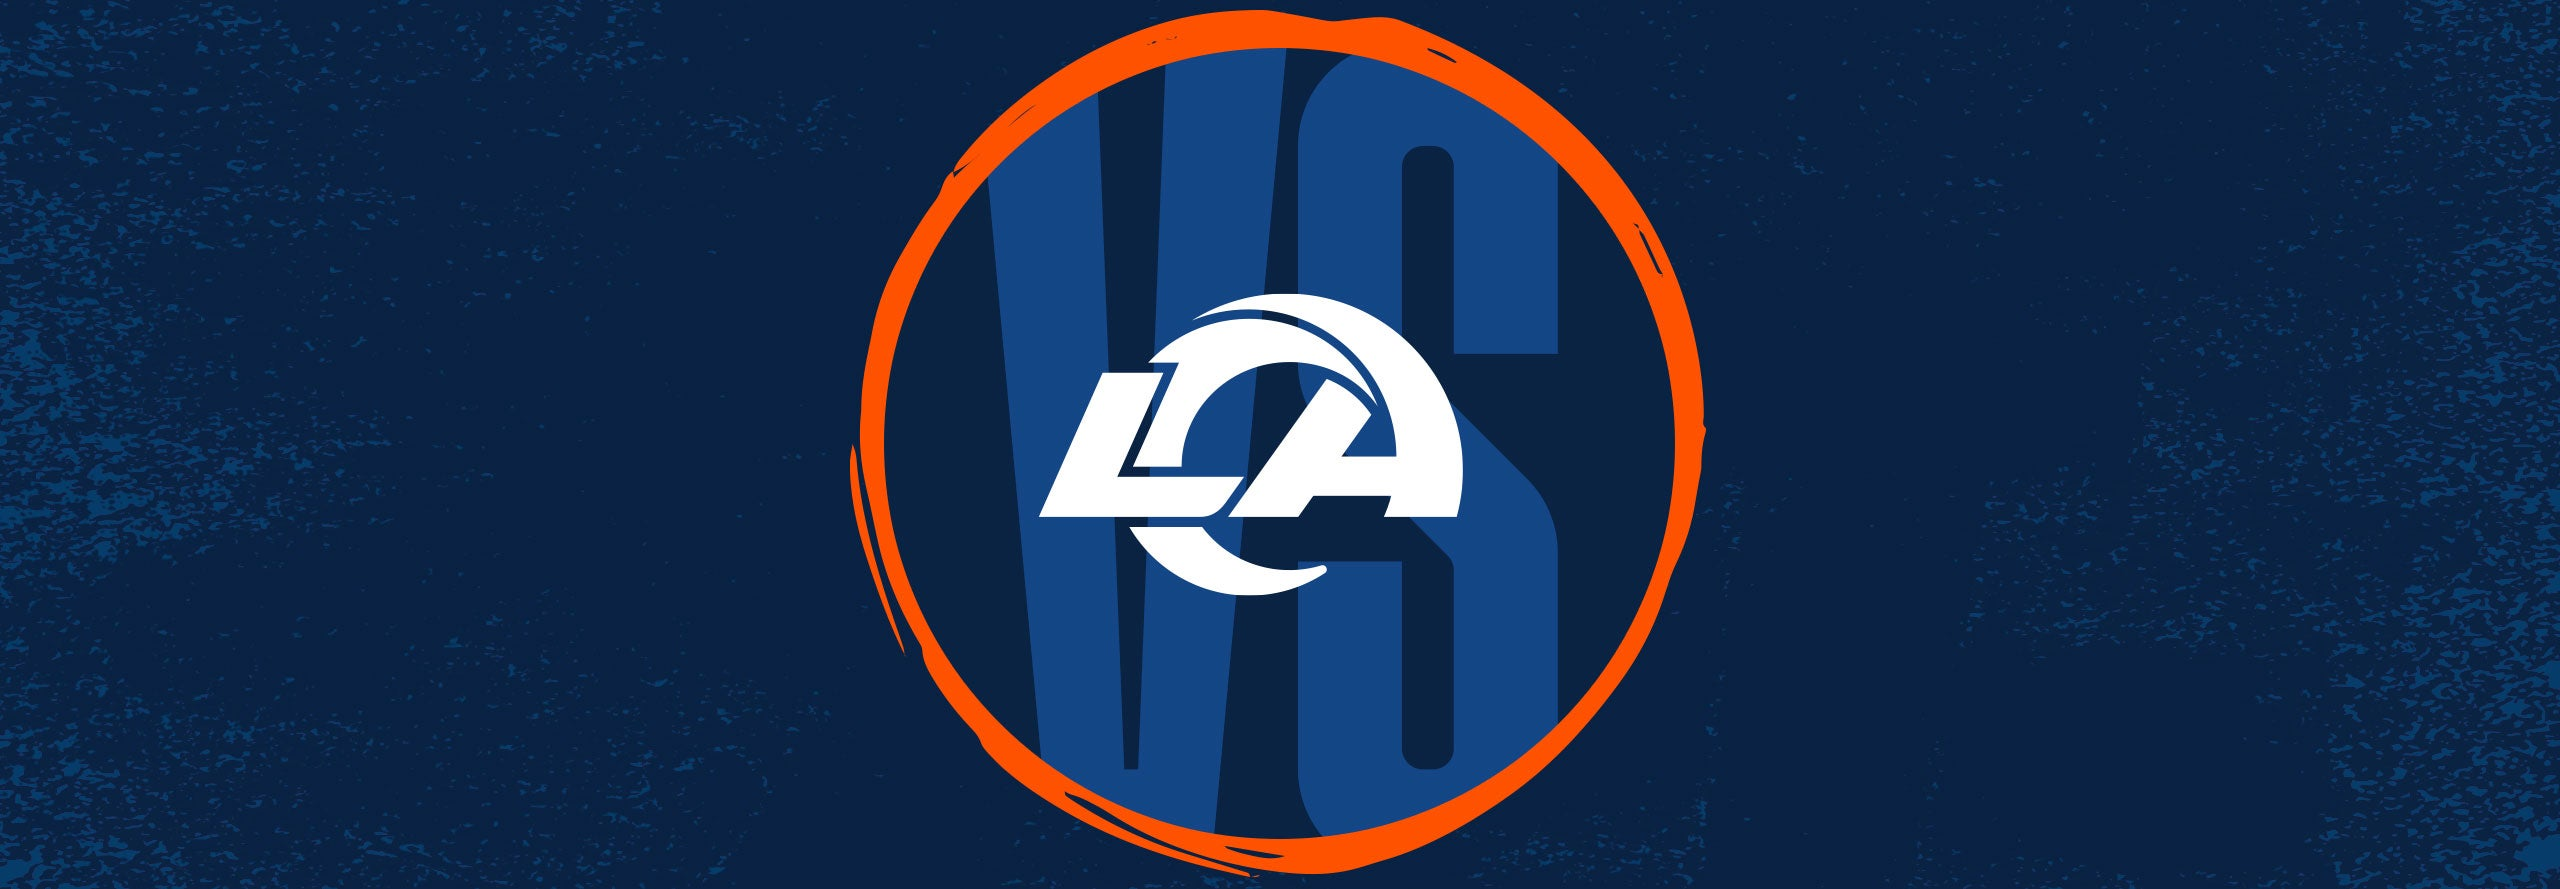 Broncos vs L.A. Rams - Preseason